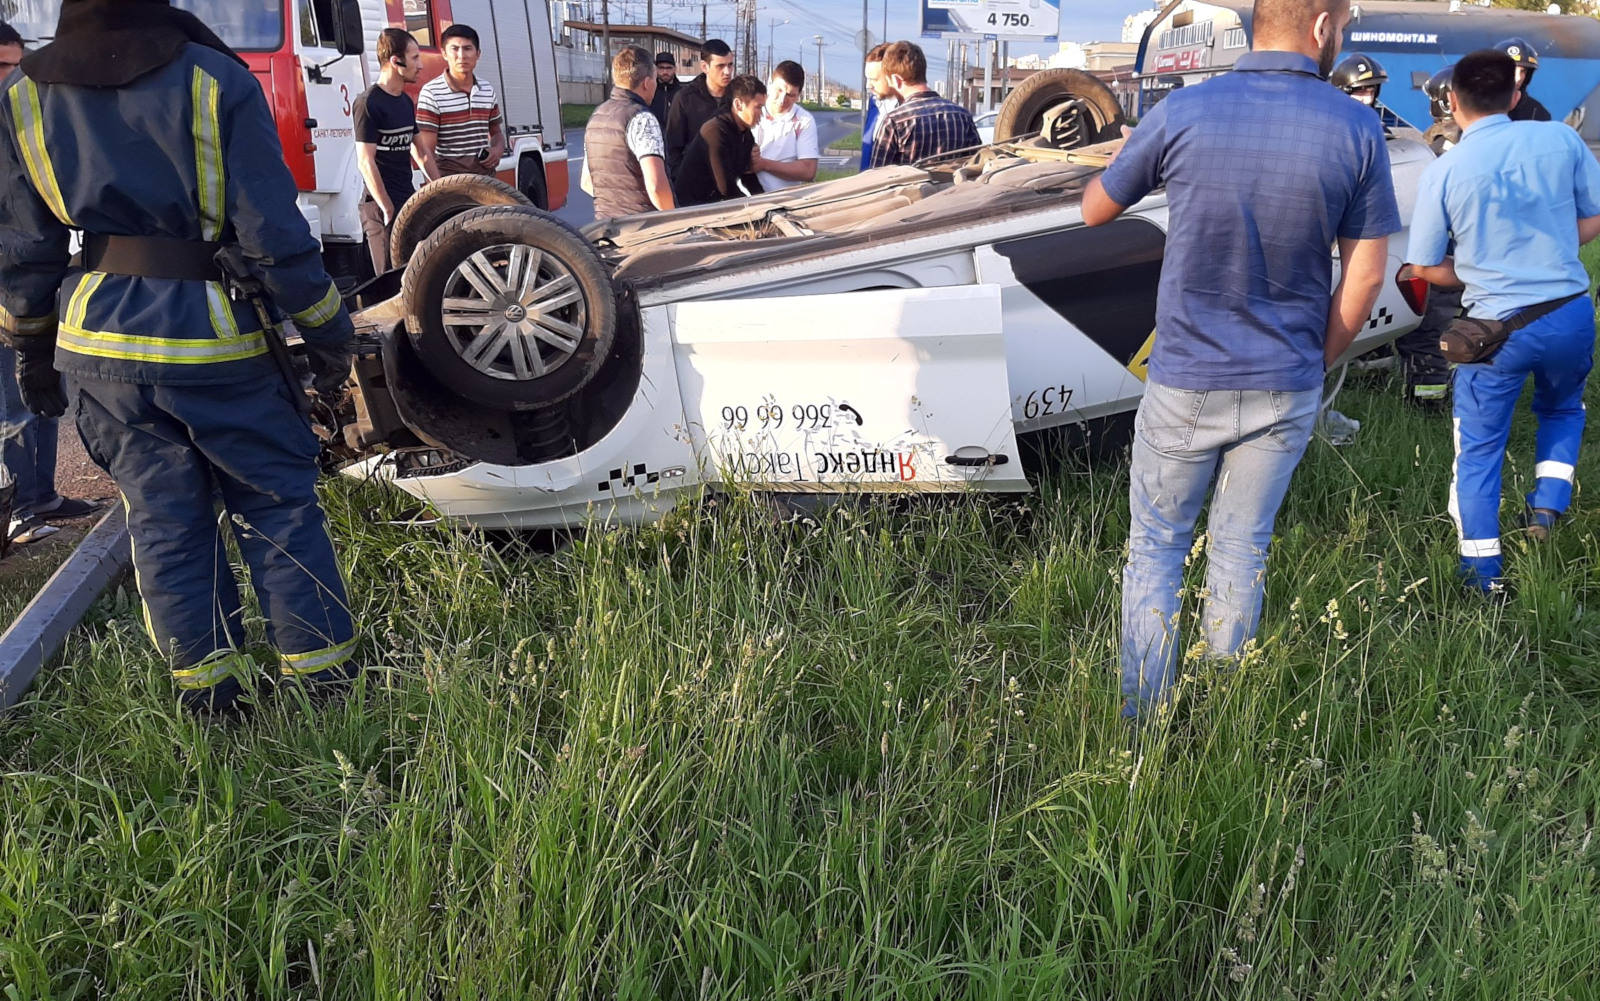 дтп авария перевернувшийся автомобиль такси